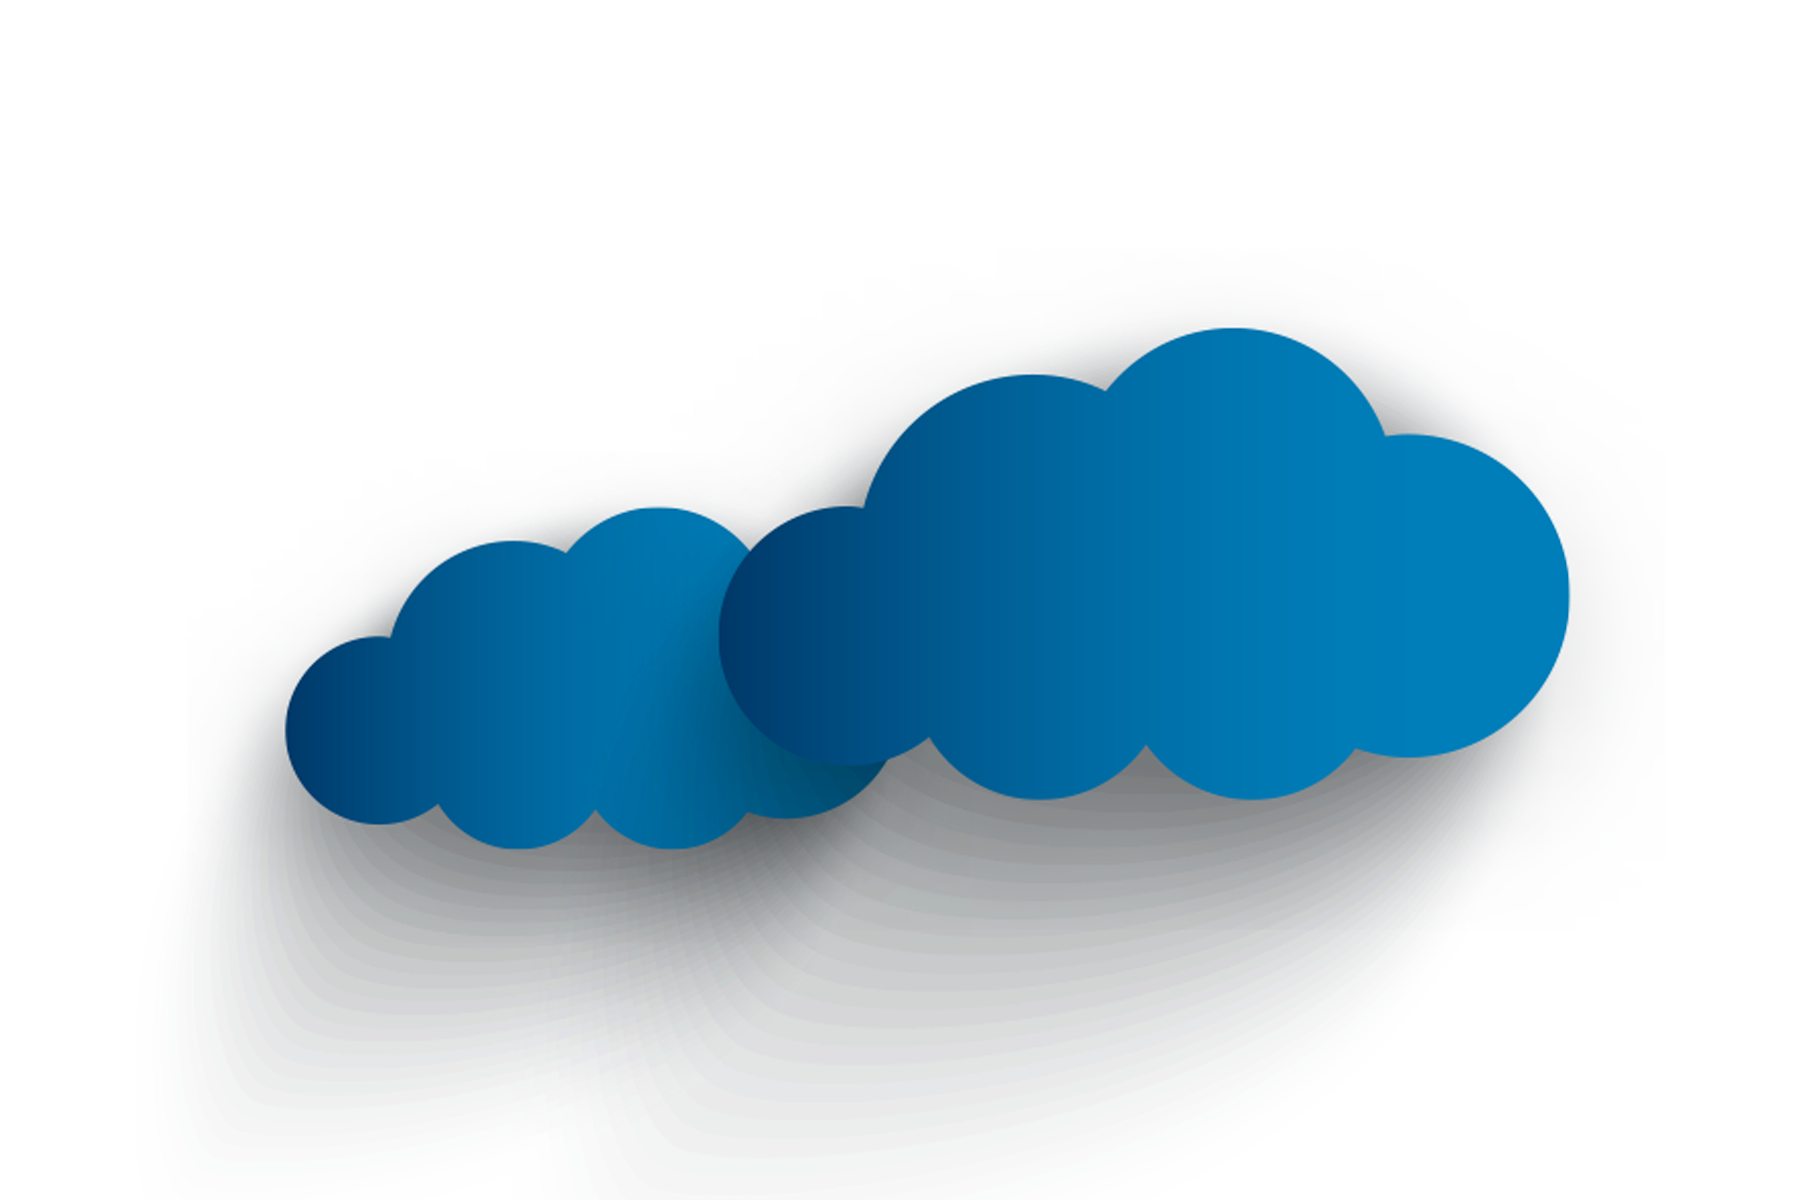 Advantages of cloud-based access control